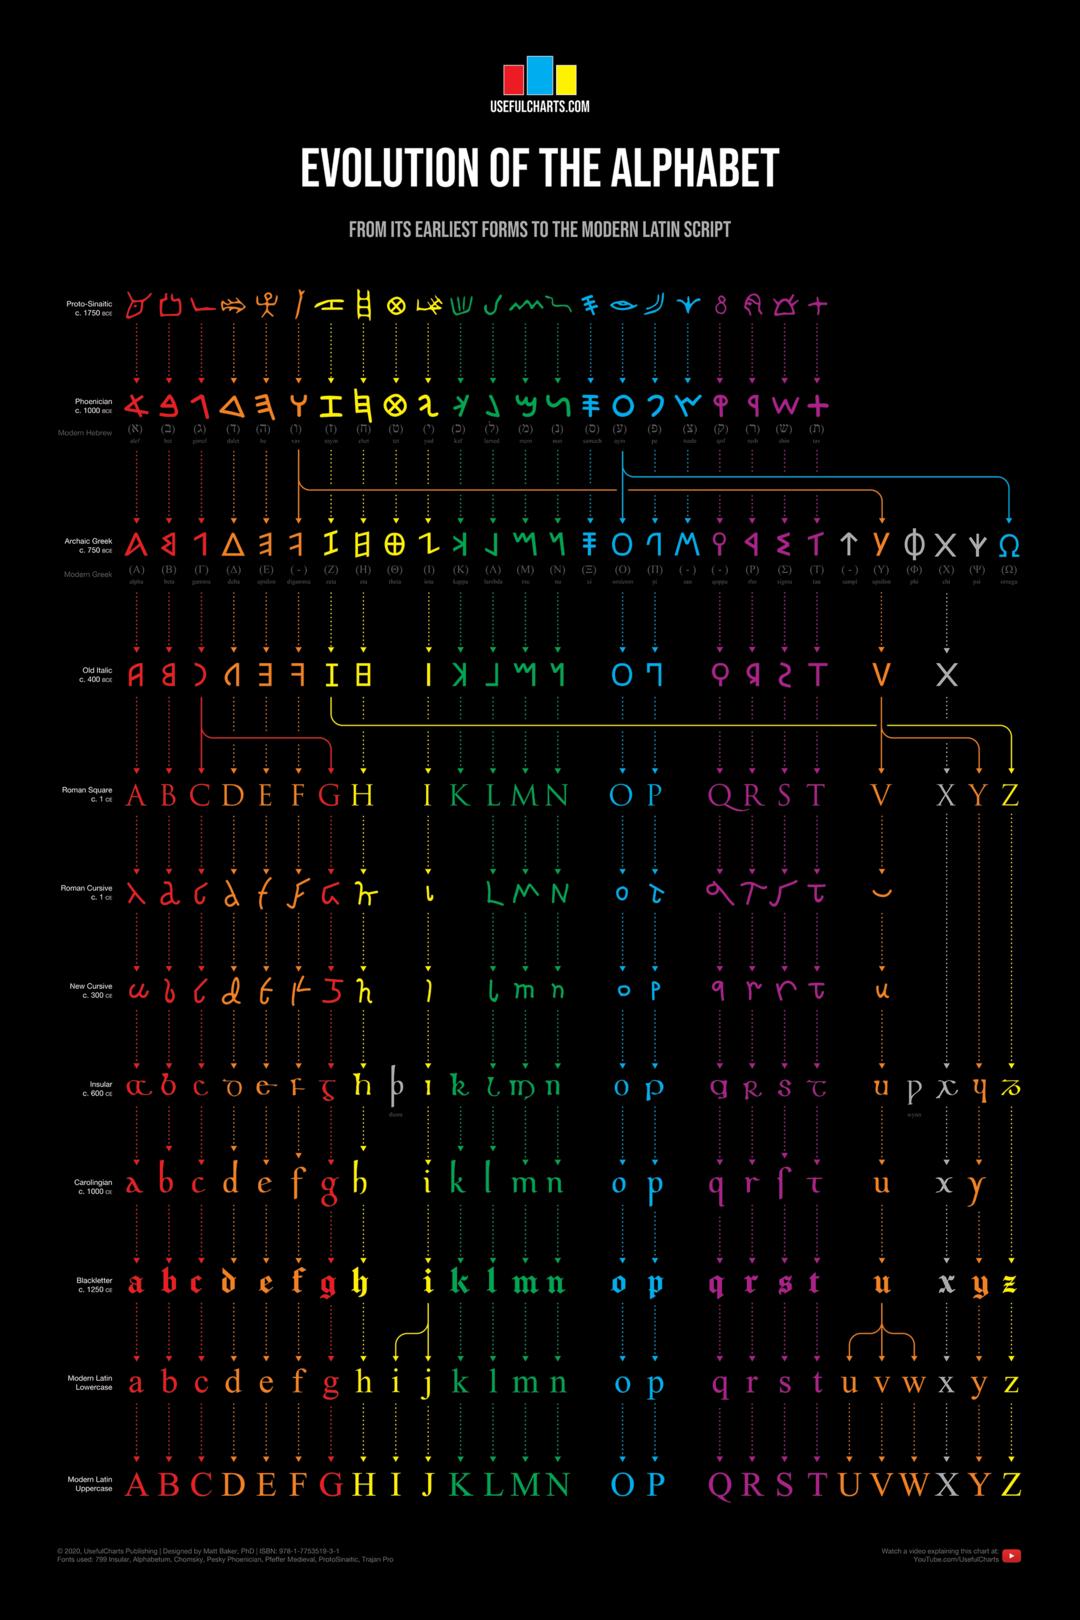 Evolution Of The Alphabet Alphabet Evolution Phoenician [ 1620 x 1080 Pixel ]